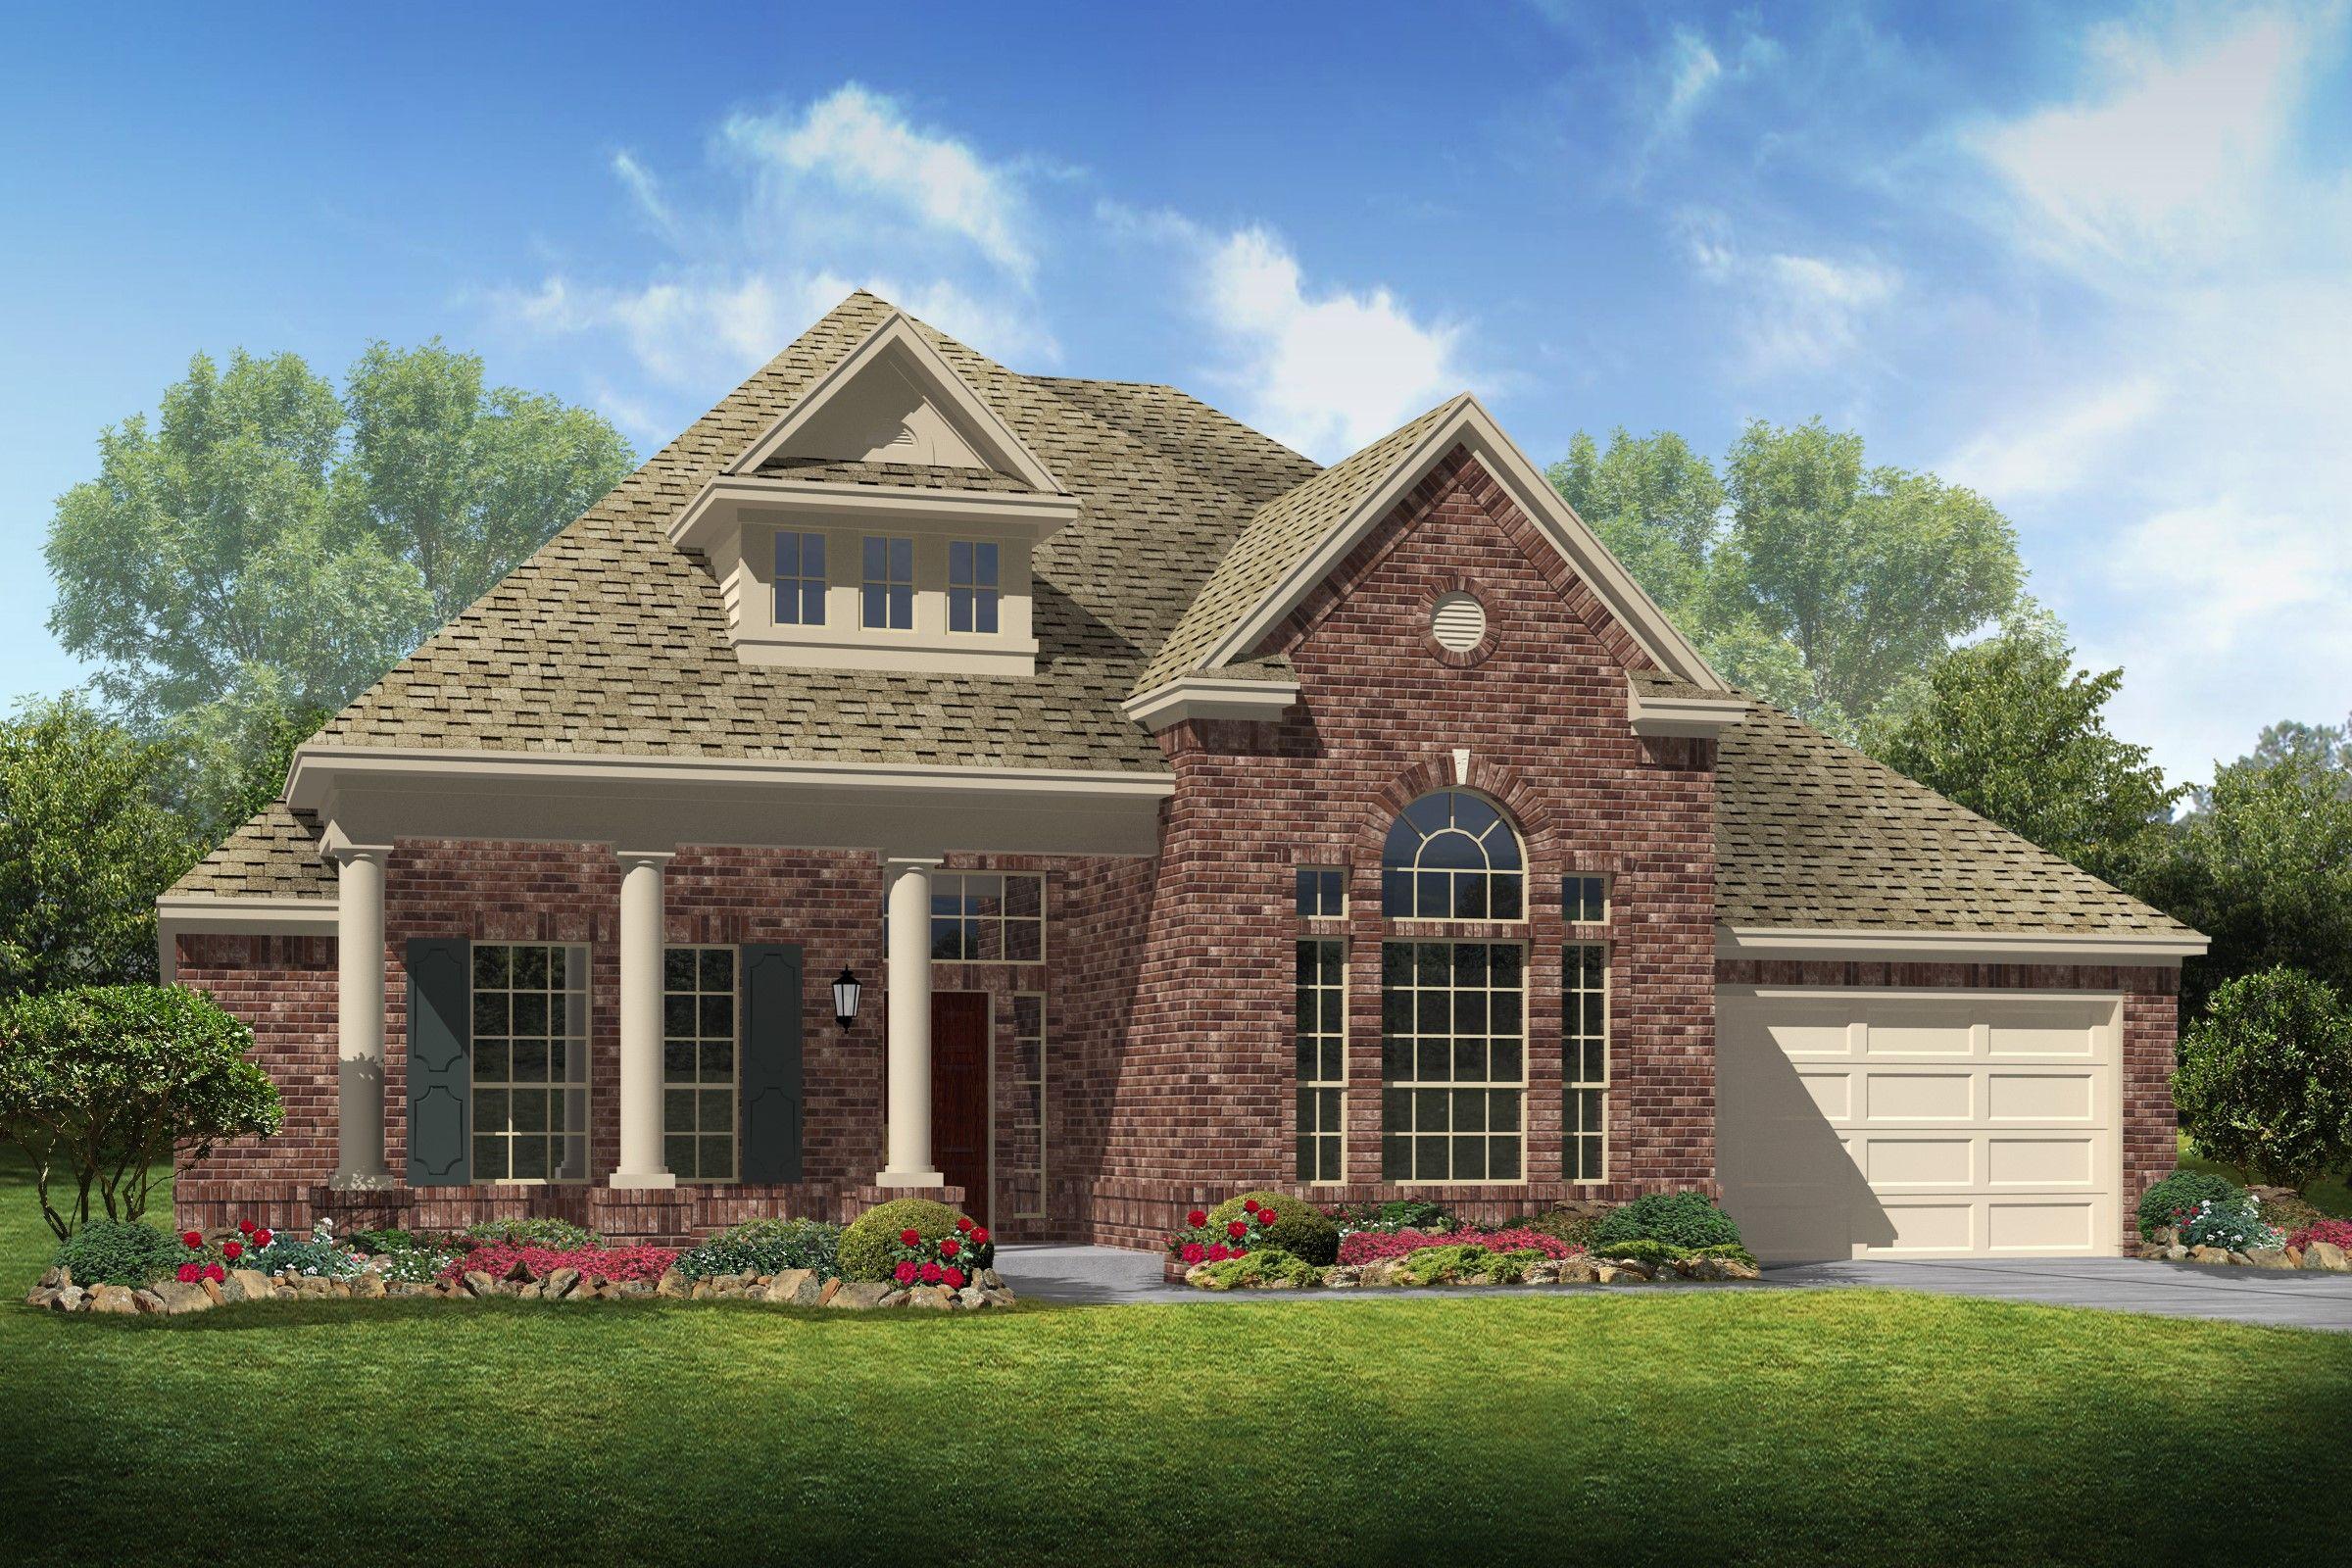 Single Family for Sale at Jada 7502 Lake Ivie, Homesite 38 Needville, Texas 77461 United States